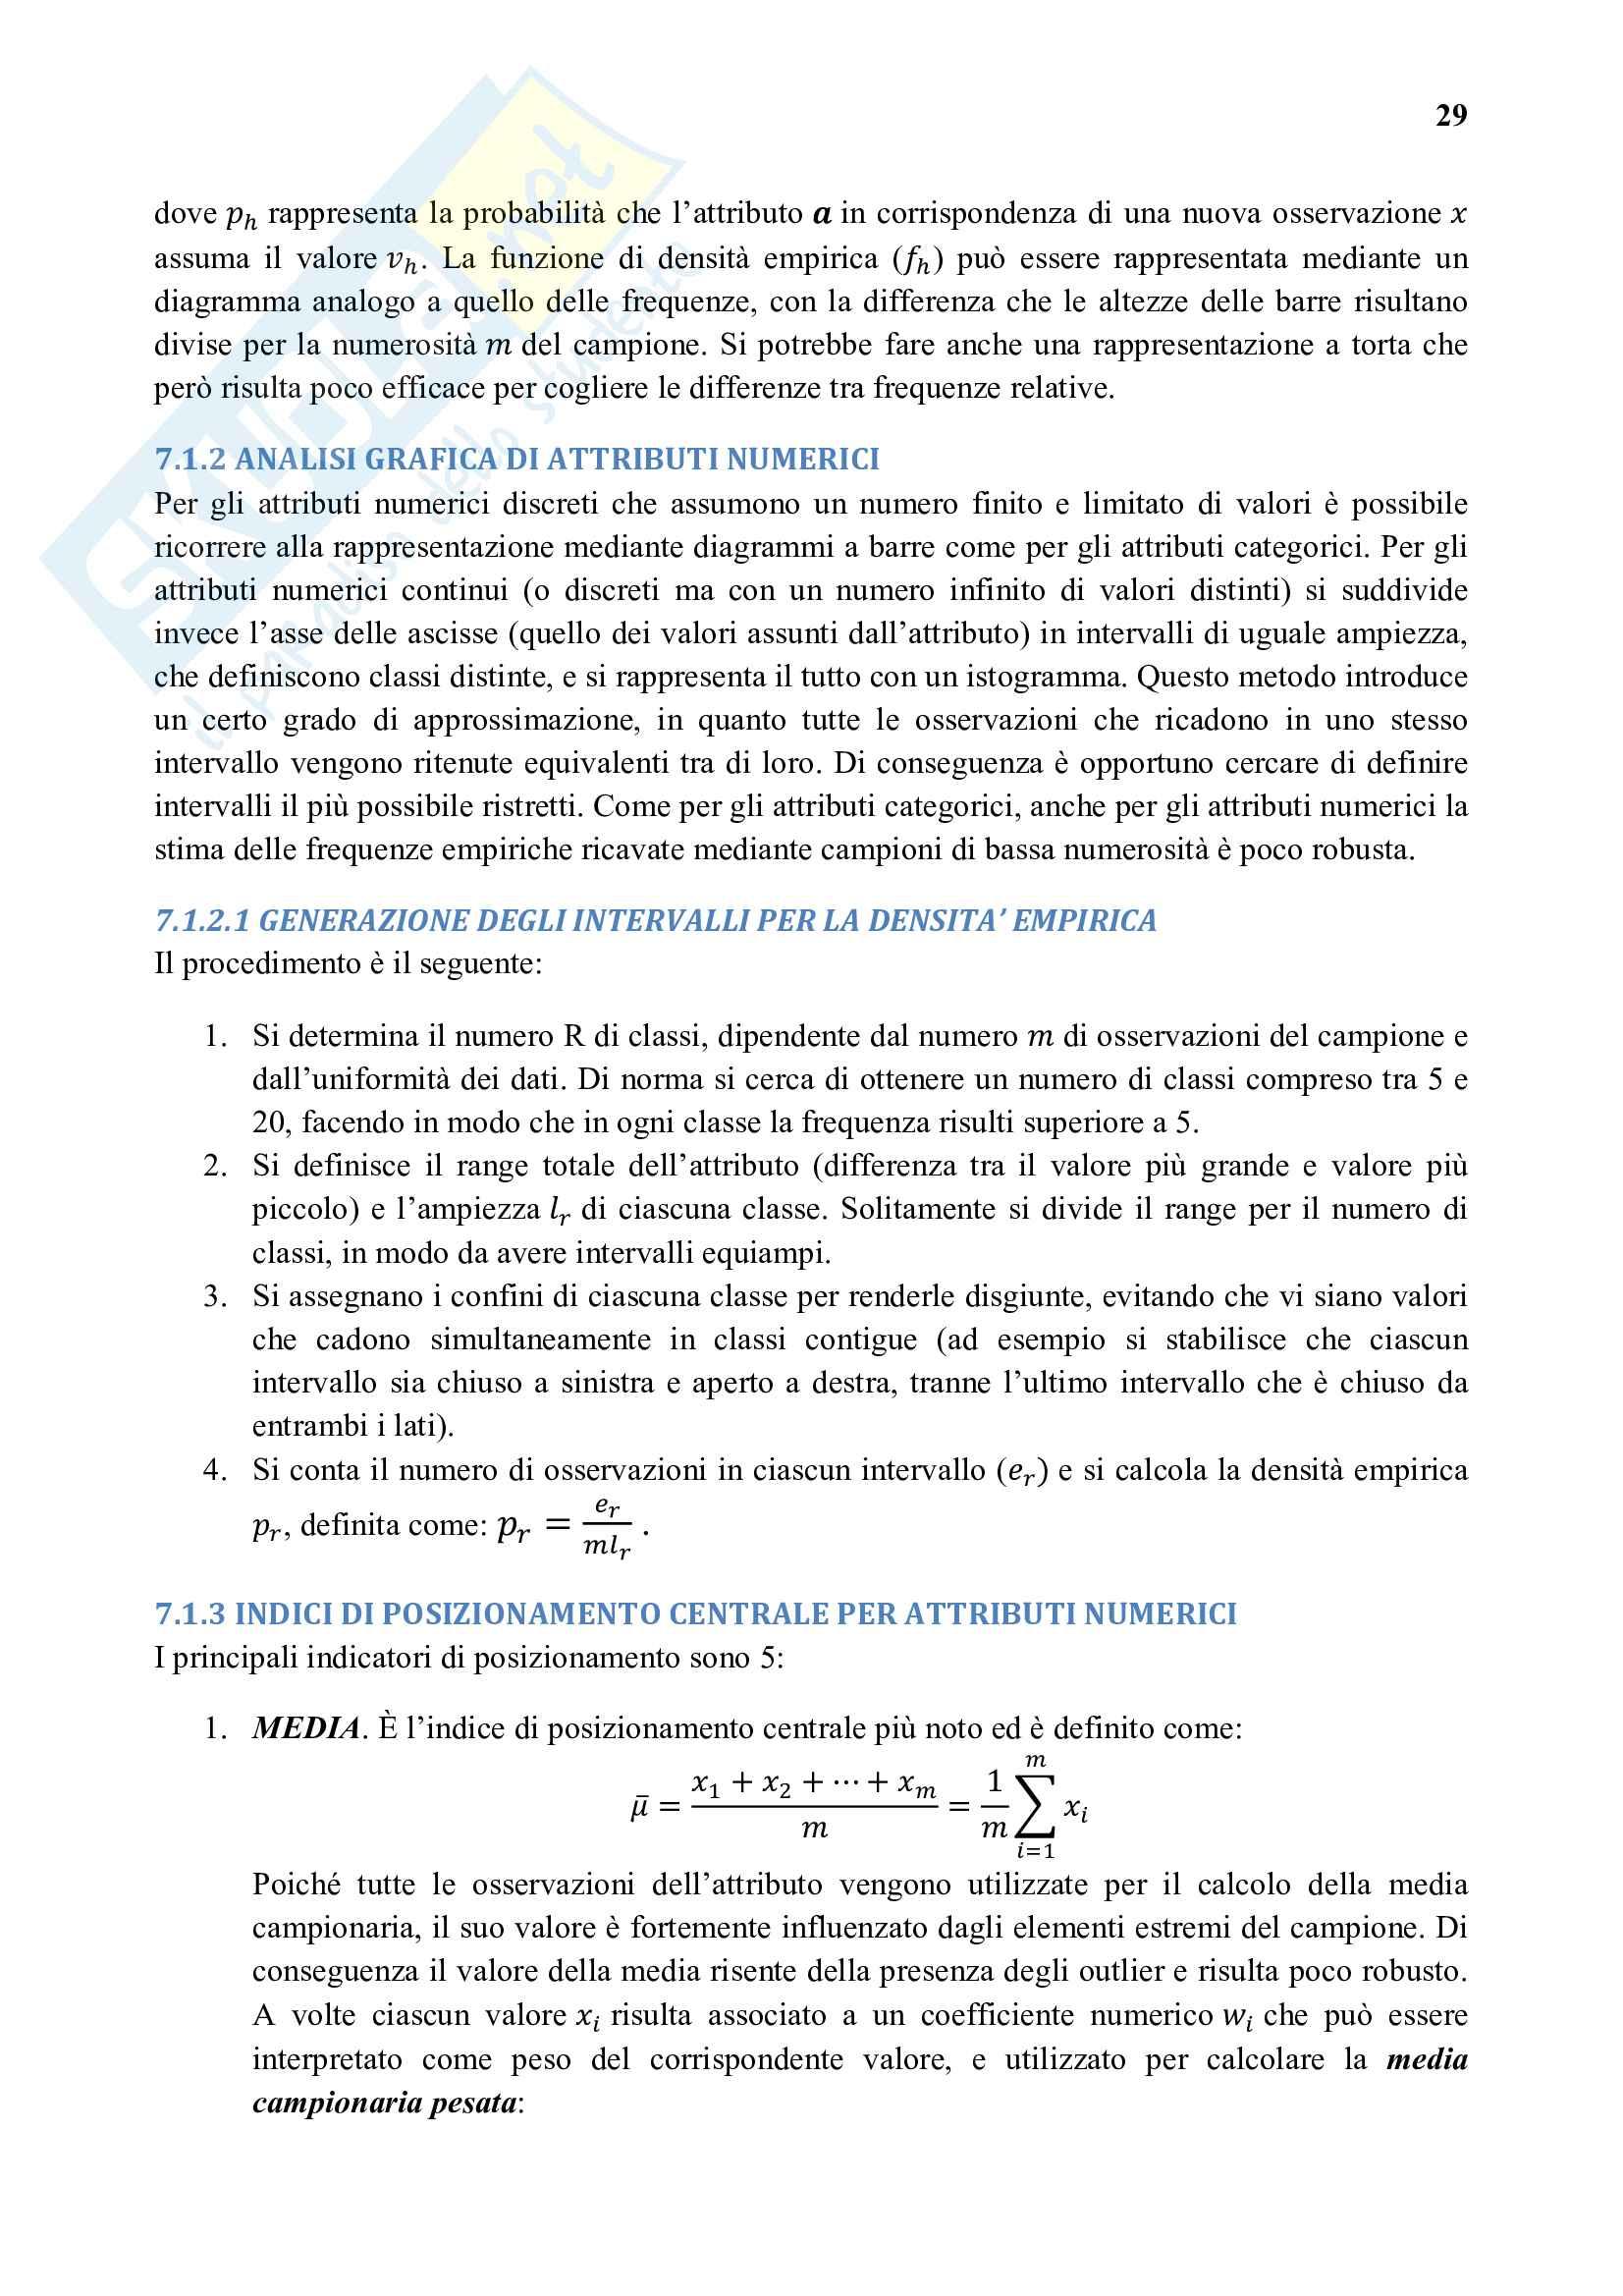 Riassunto esame Business Intelligence e Data Mining, prof. Vercellis, libro consigliato Business Intelligence e Data Mining, Vercellis Pag. 36